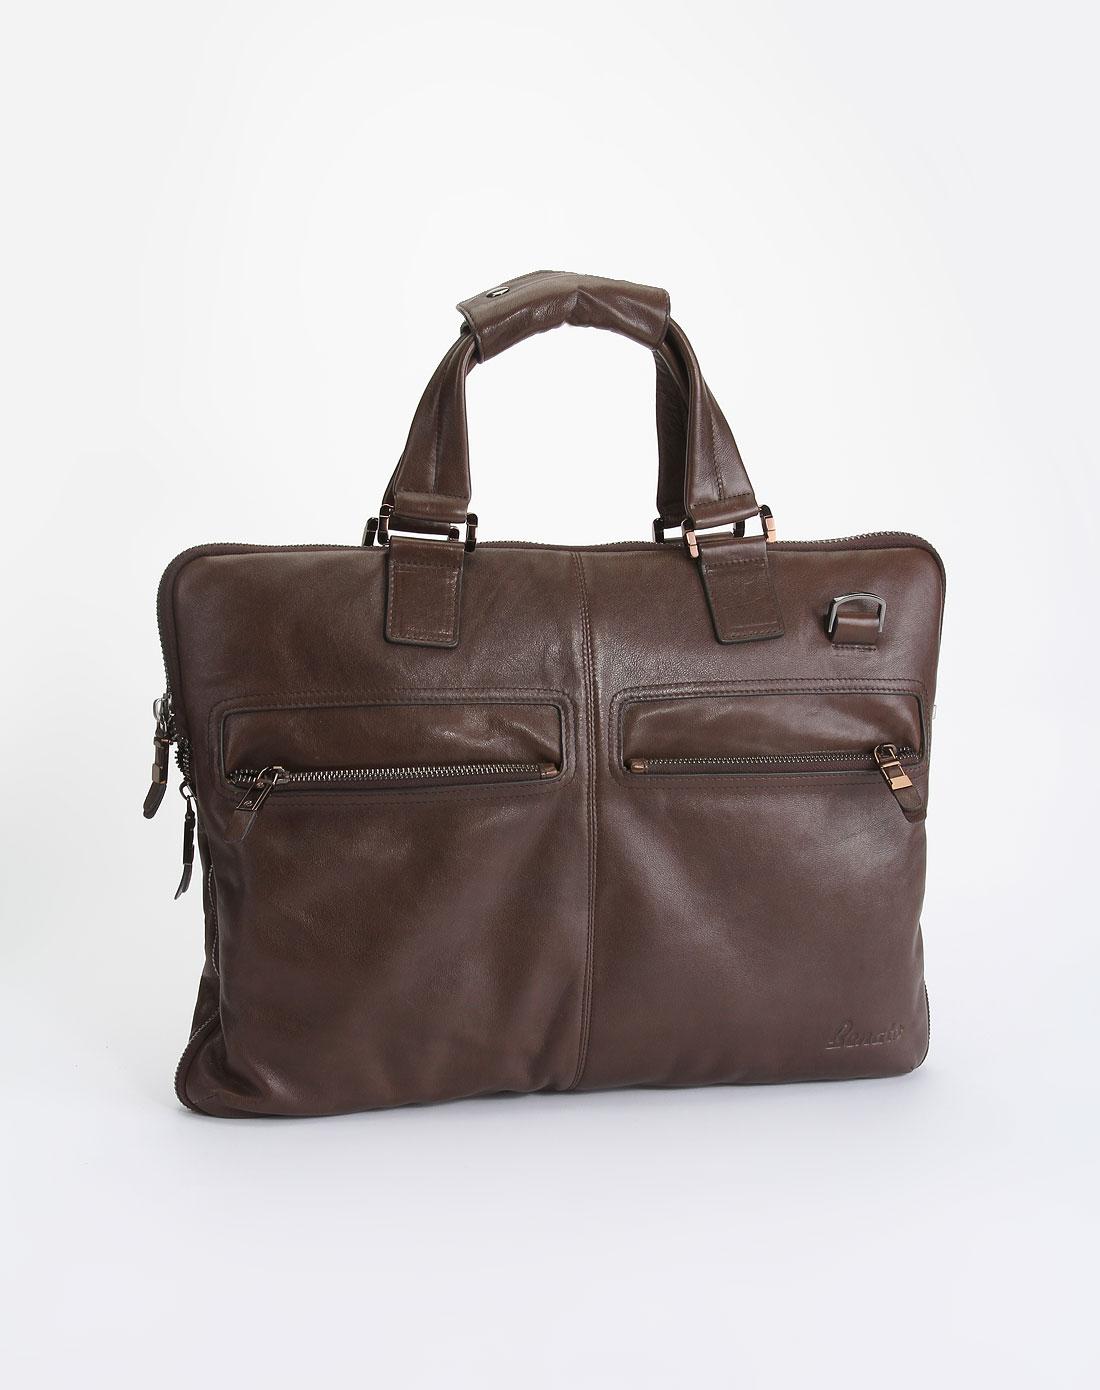 benato男款棕色时尚商务手提包10290301202m